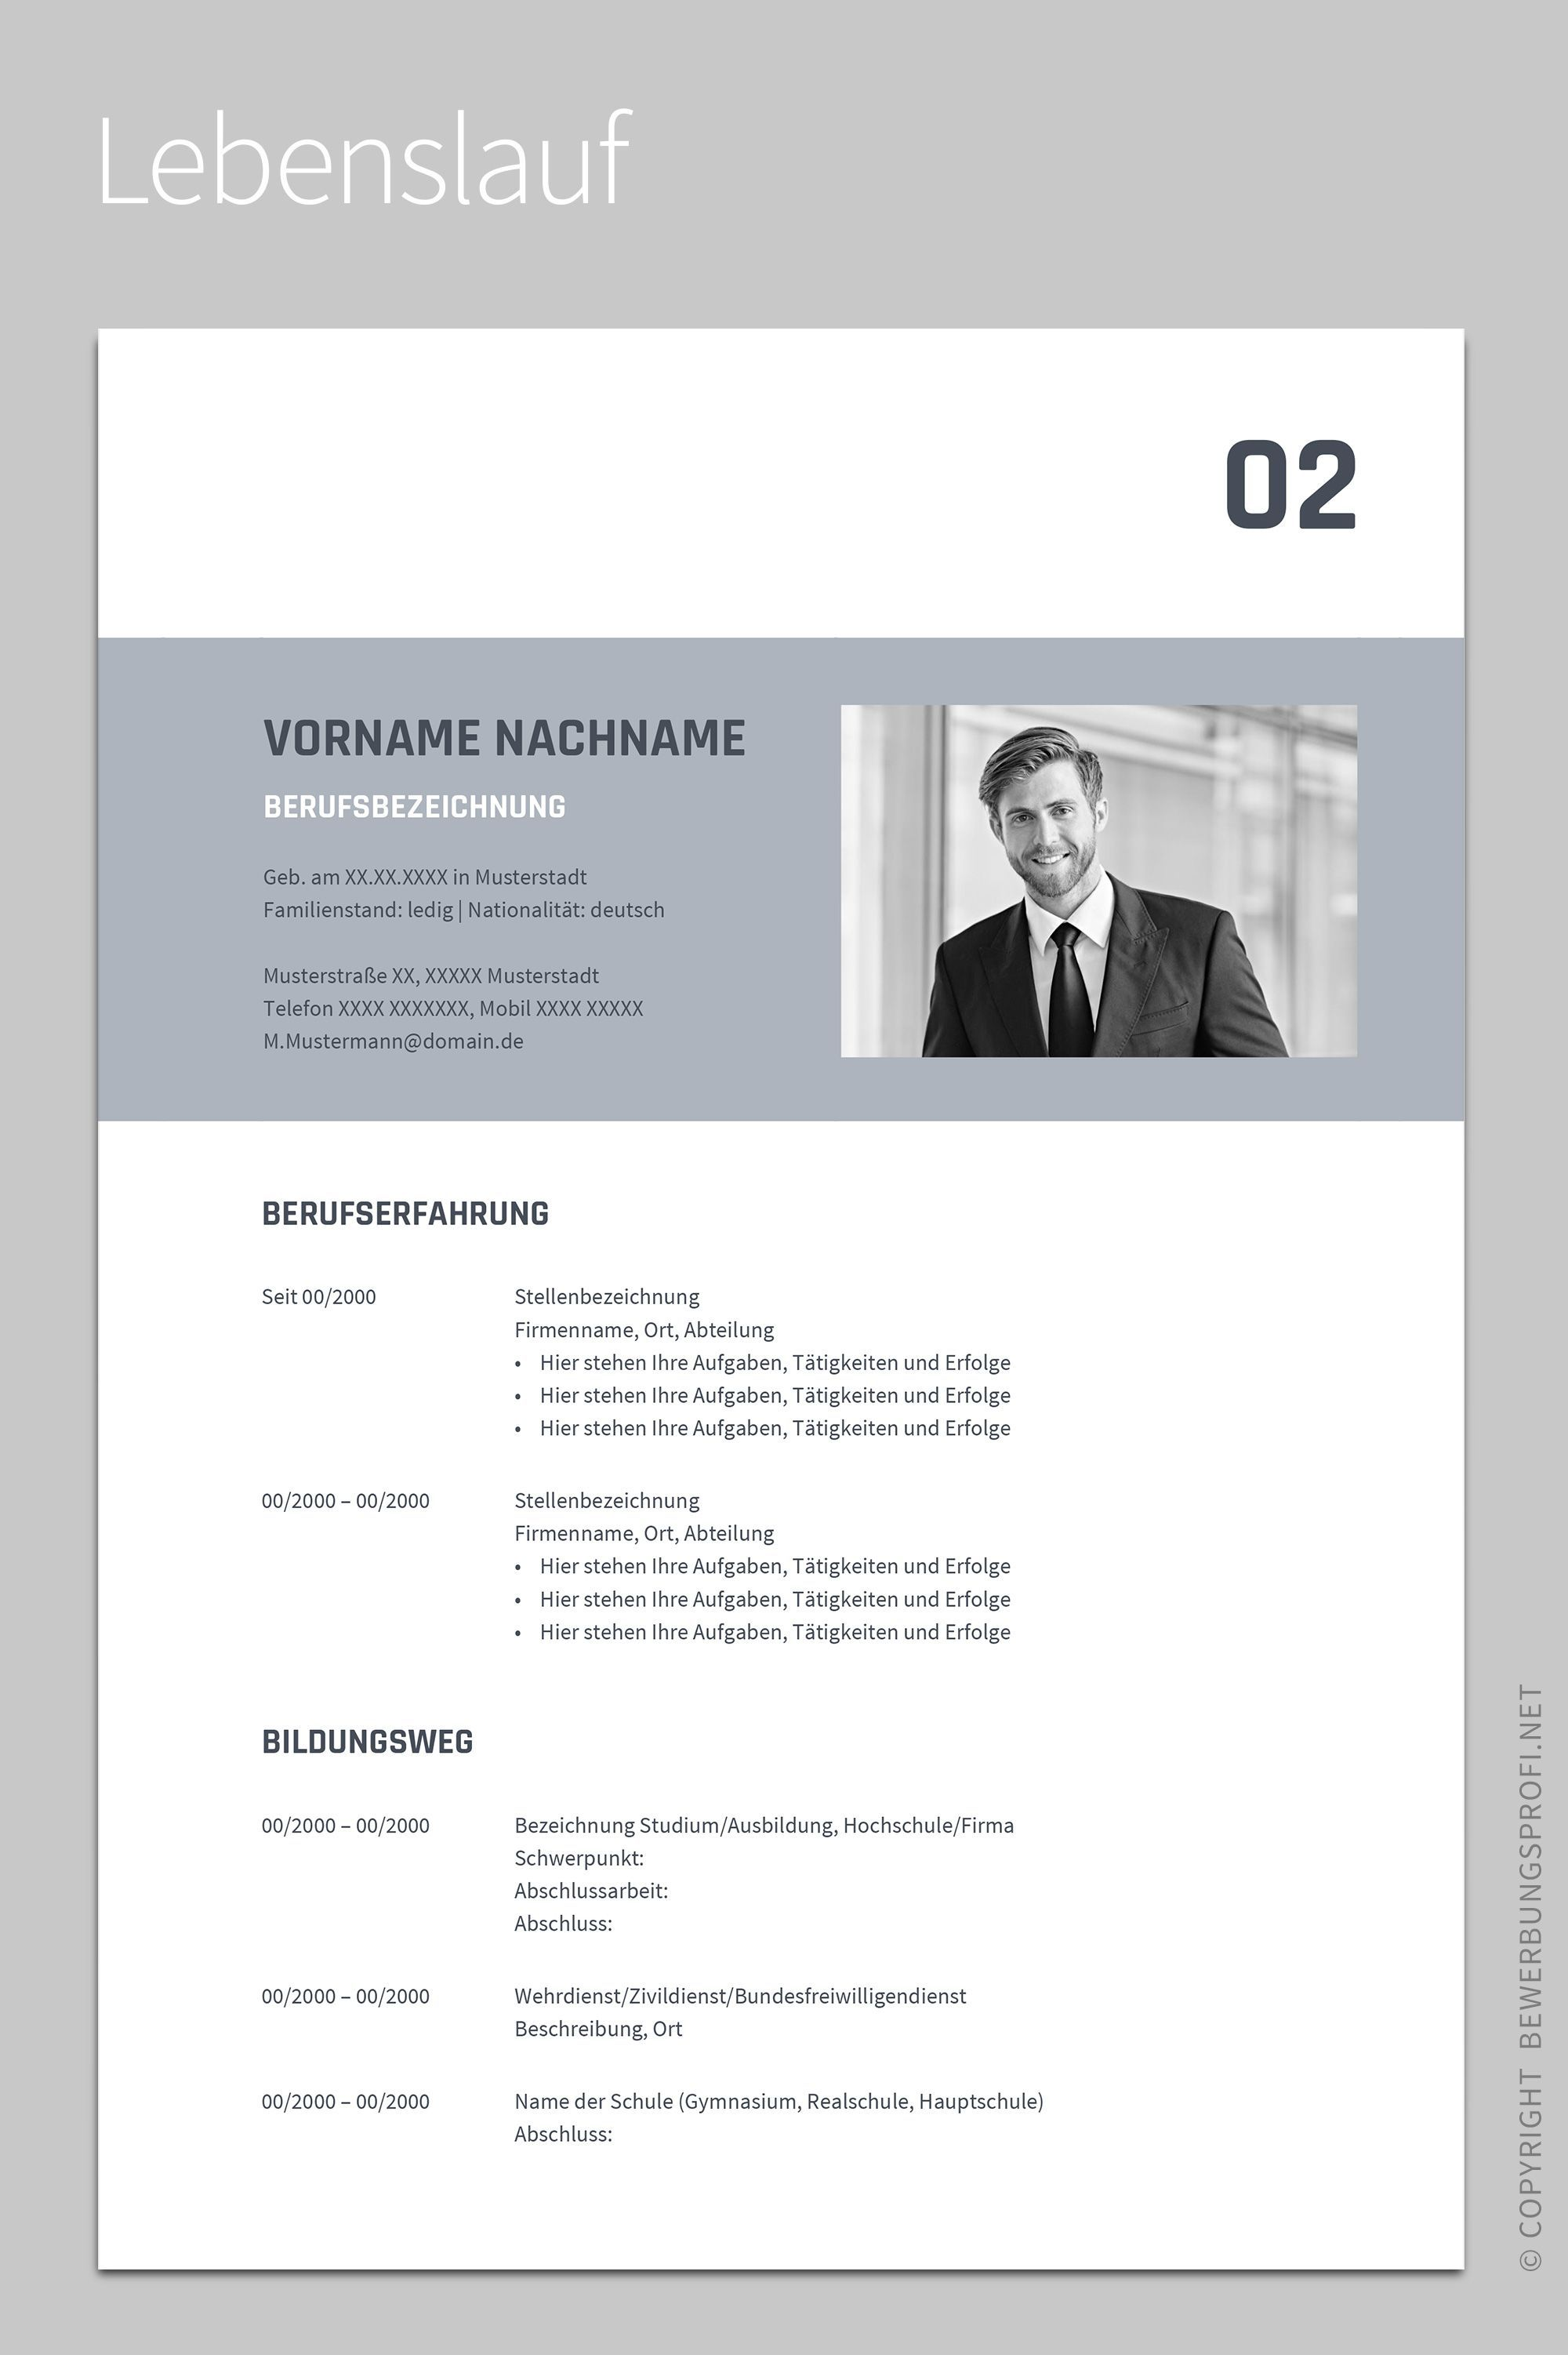 24+ Online Lebenslauf Design in 2020 (With images